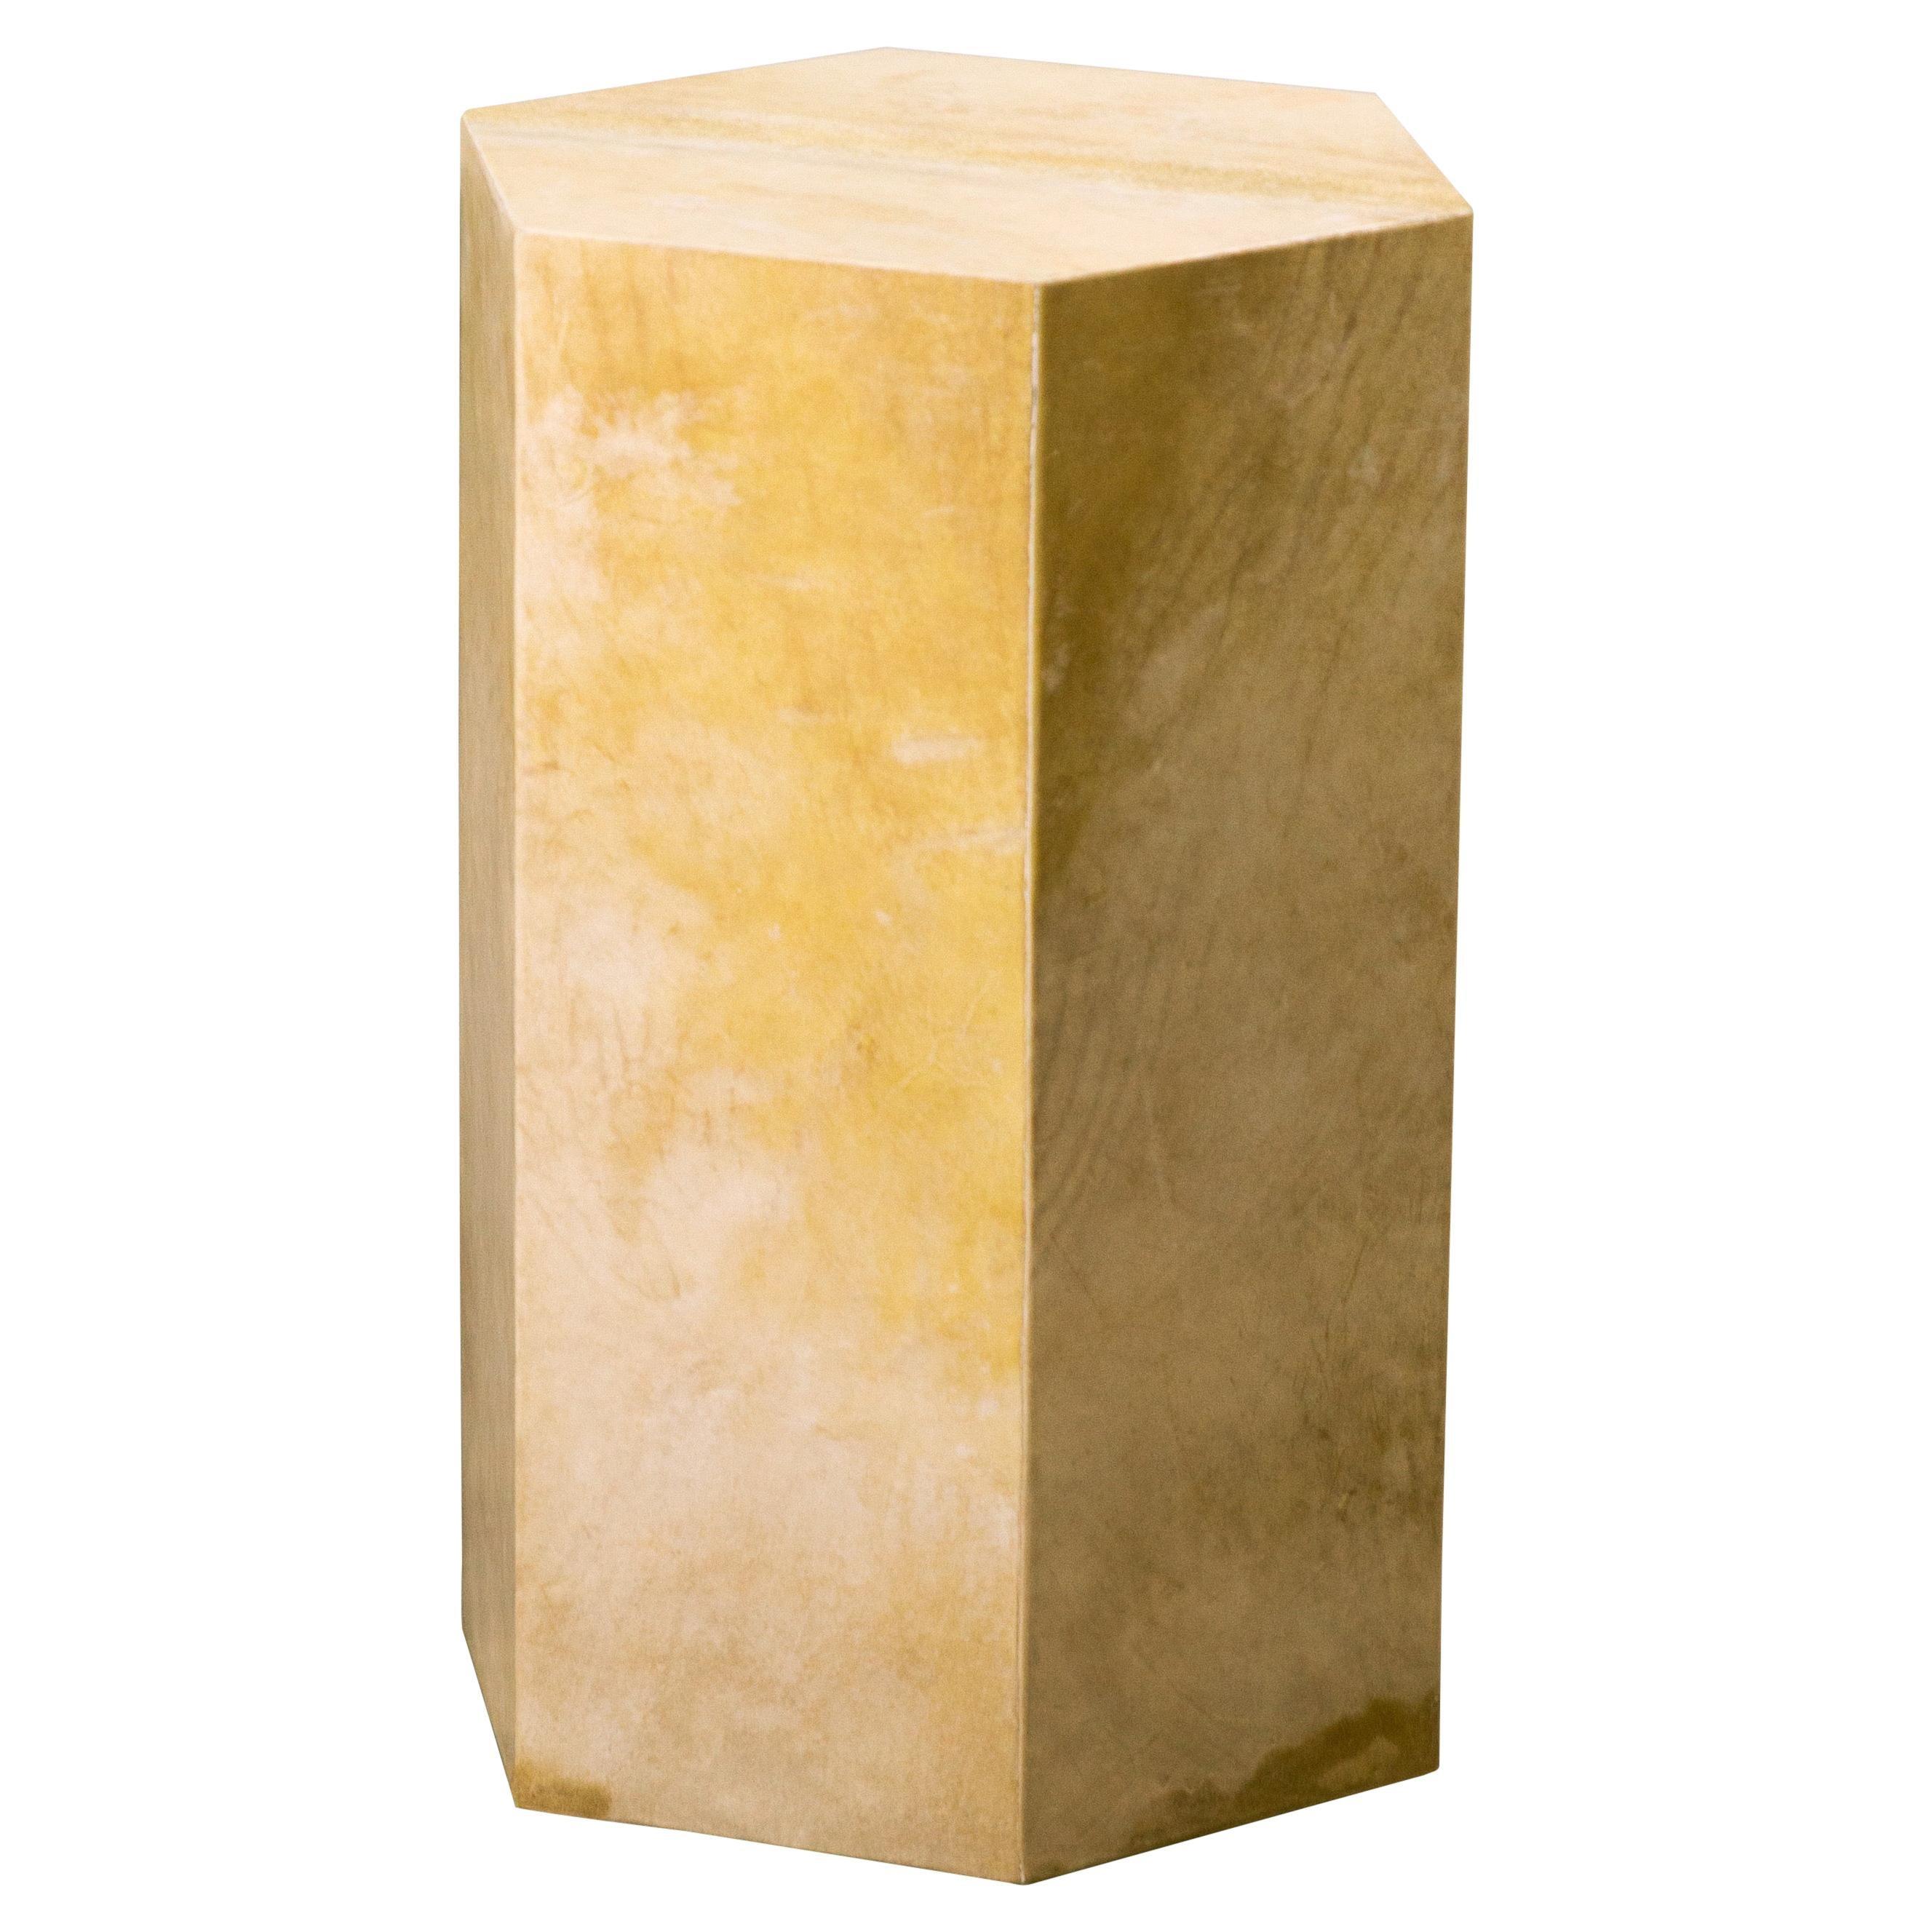 Goatskin Modern Minimal Side Table from Costantini, Pergamino Hex 'In Stock'